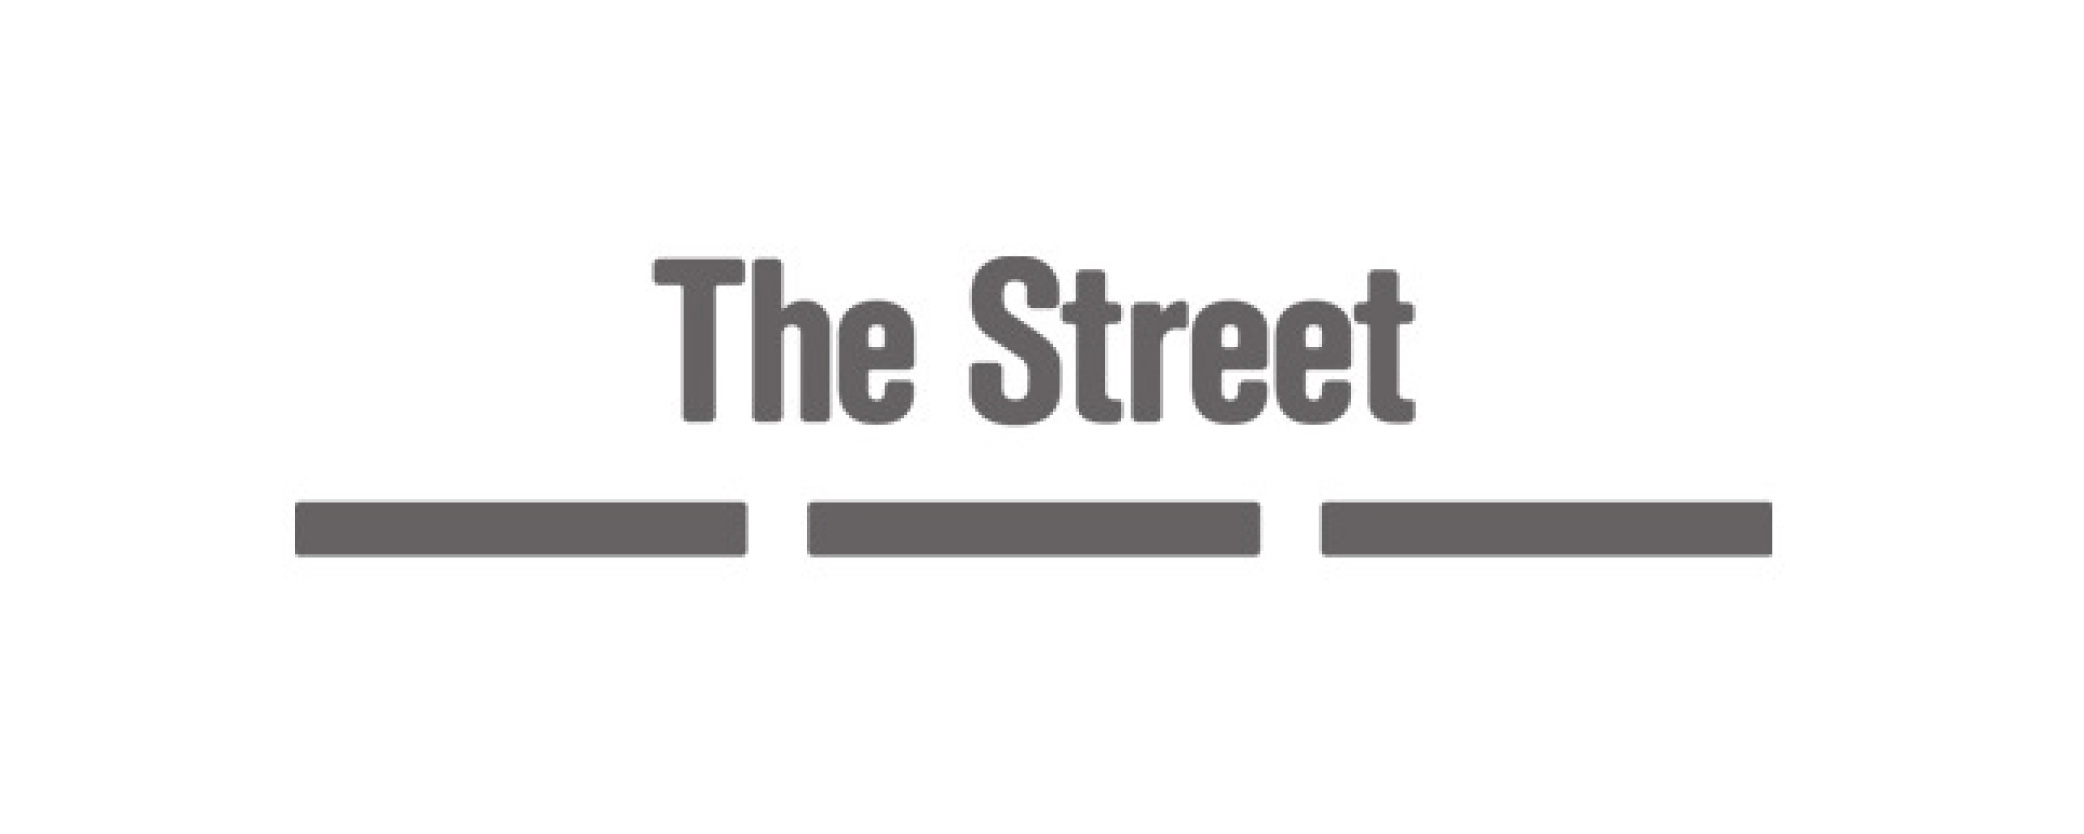 The Street Grey 500 x 200.jpg